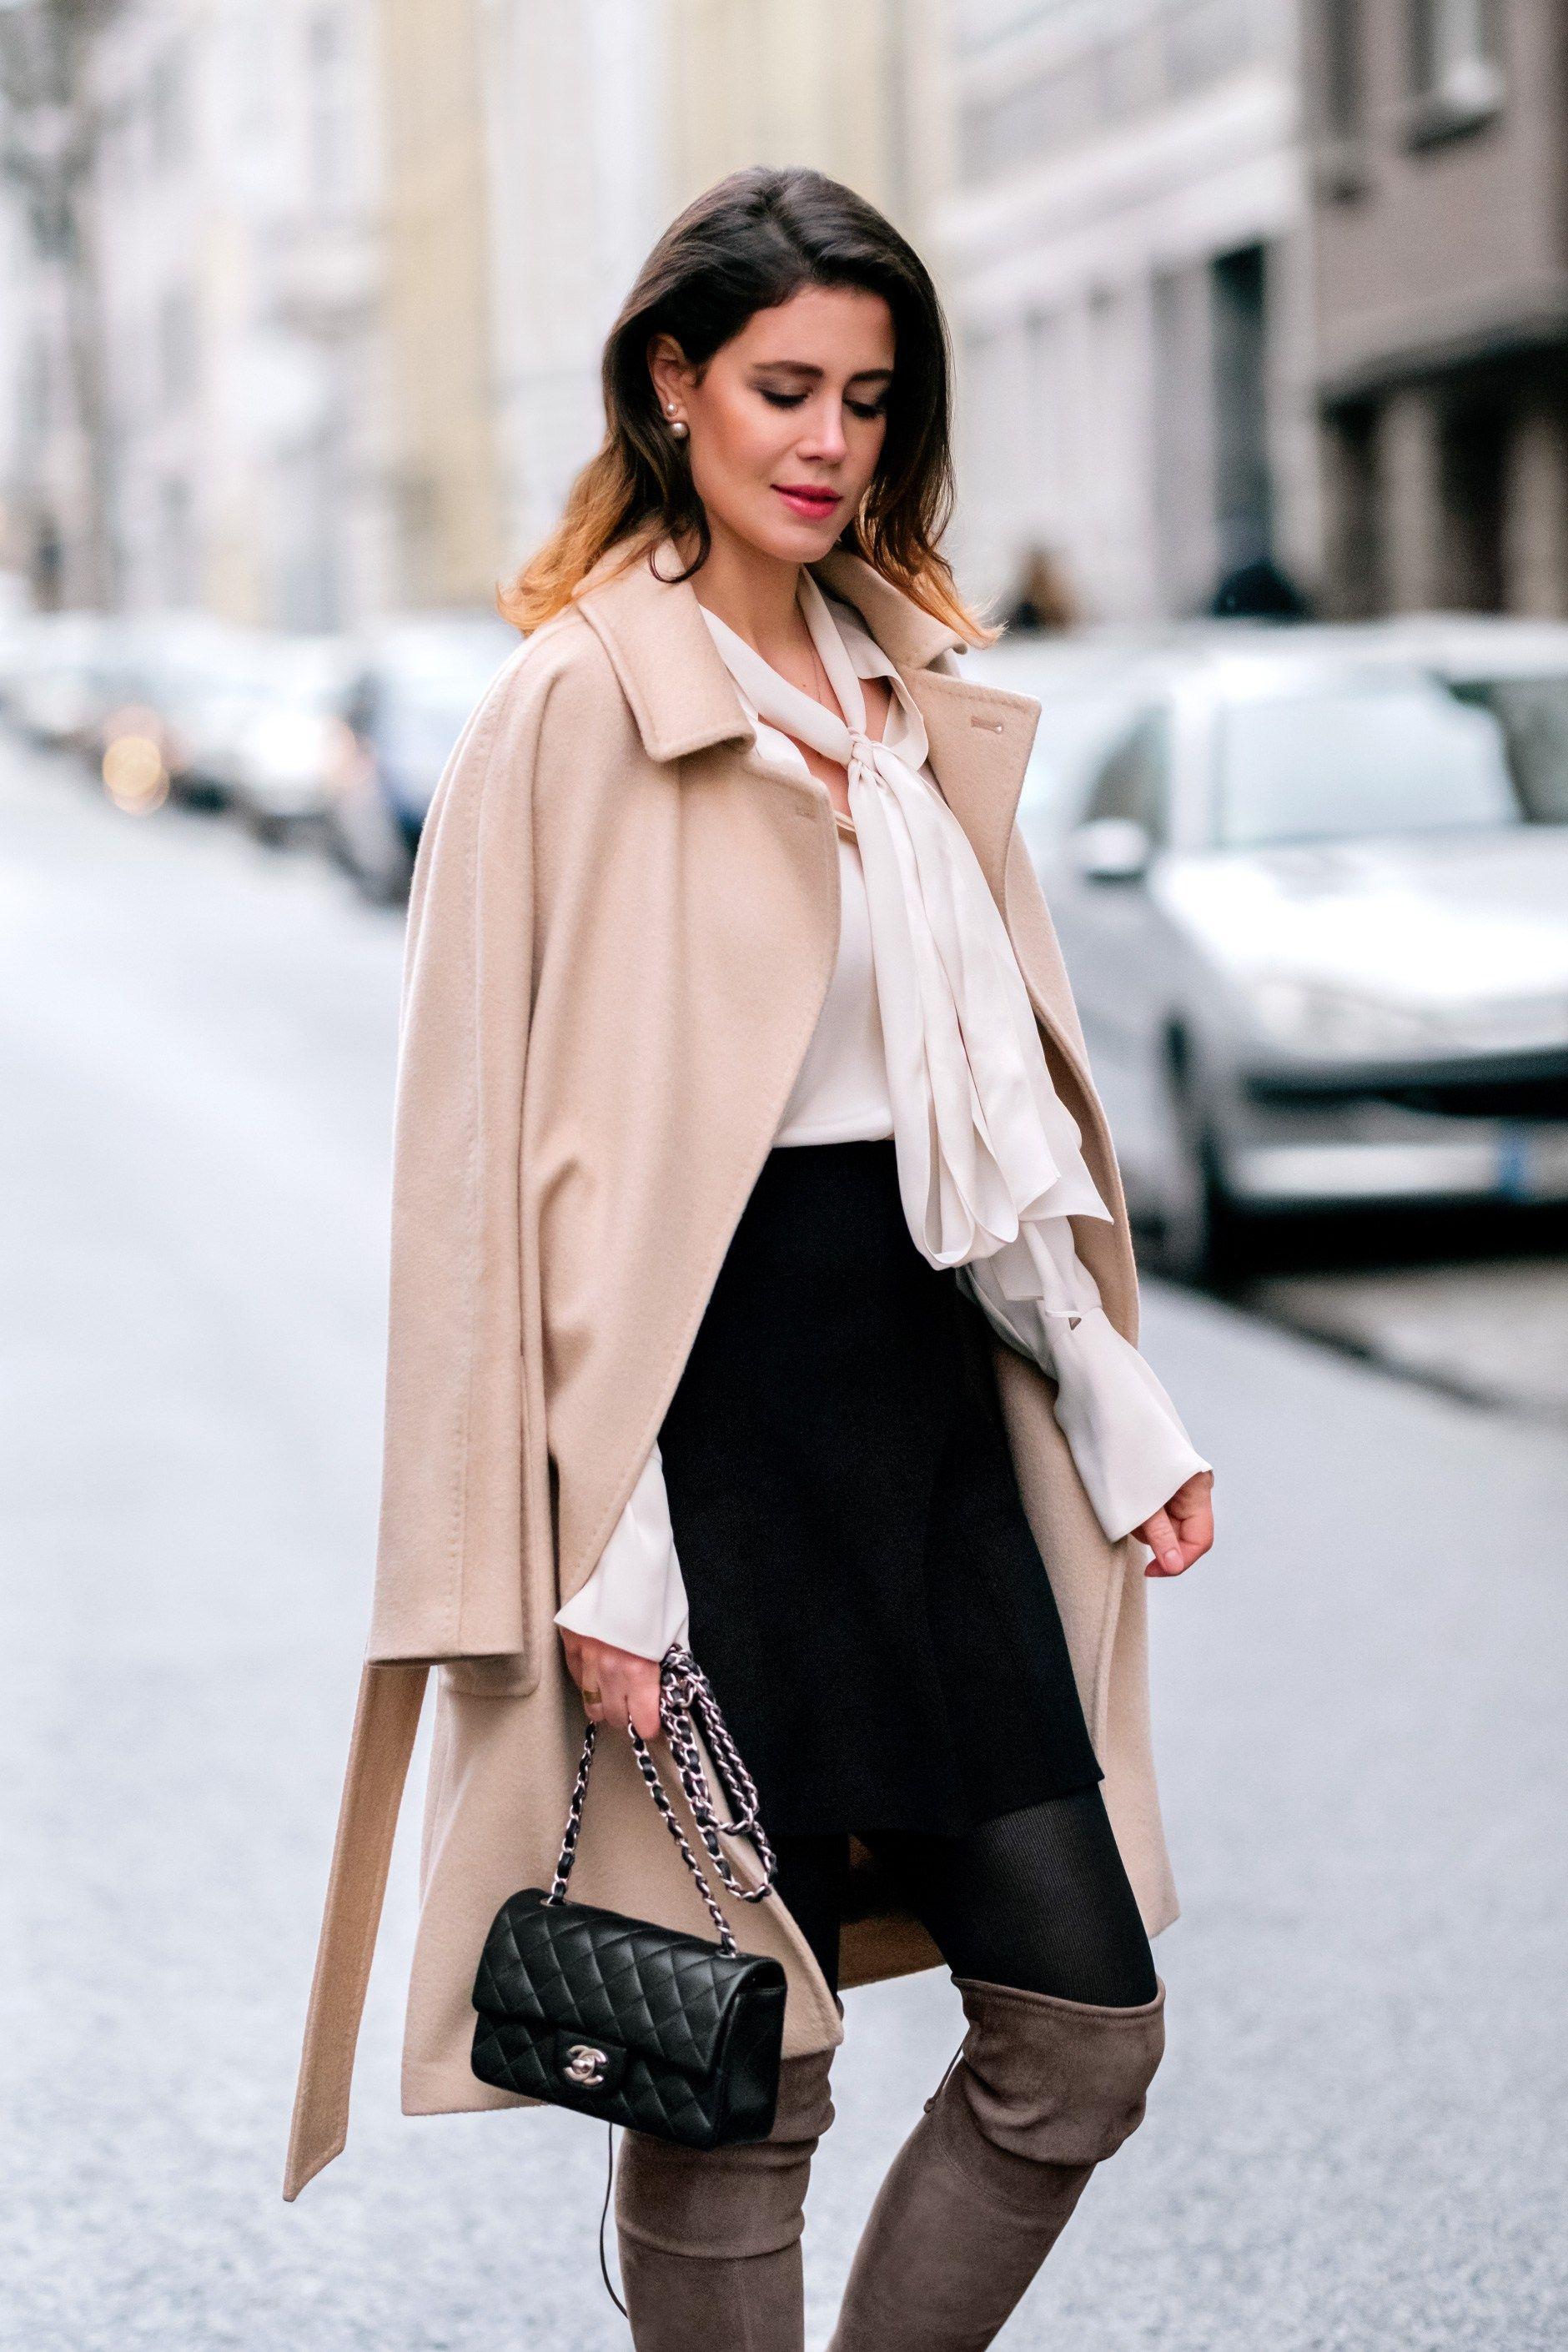 c43858f59f139 Chloé silk blouse and Max Mara Lampo coat  handbag Chanel rectangular Mini